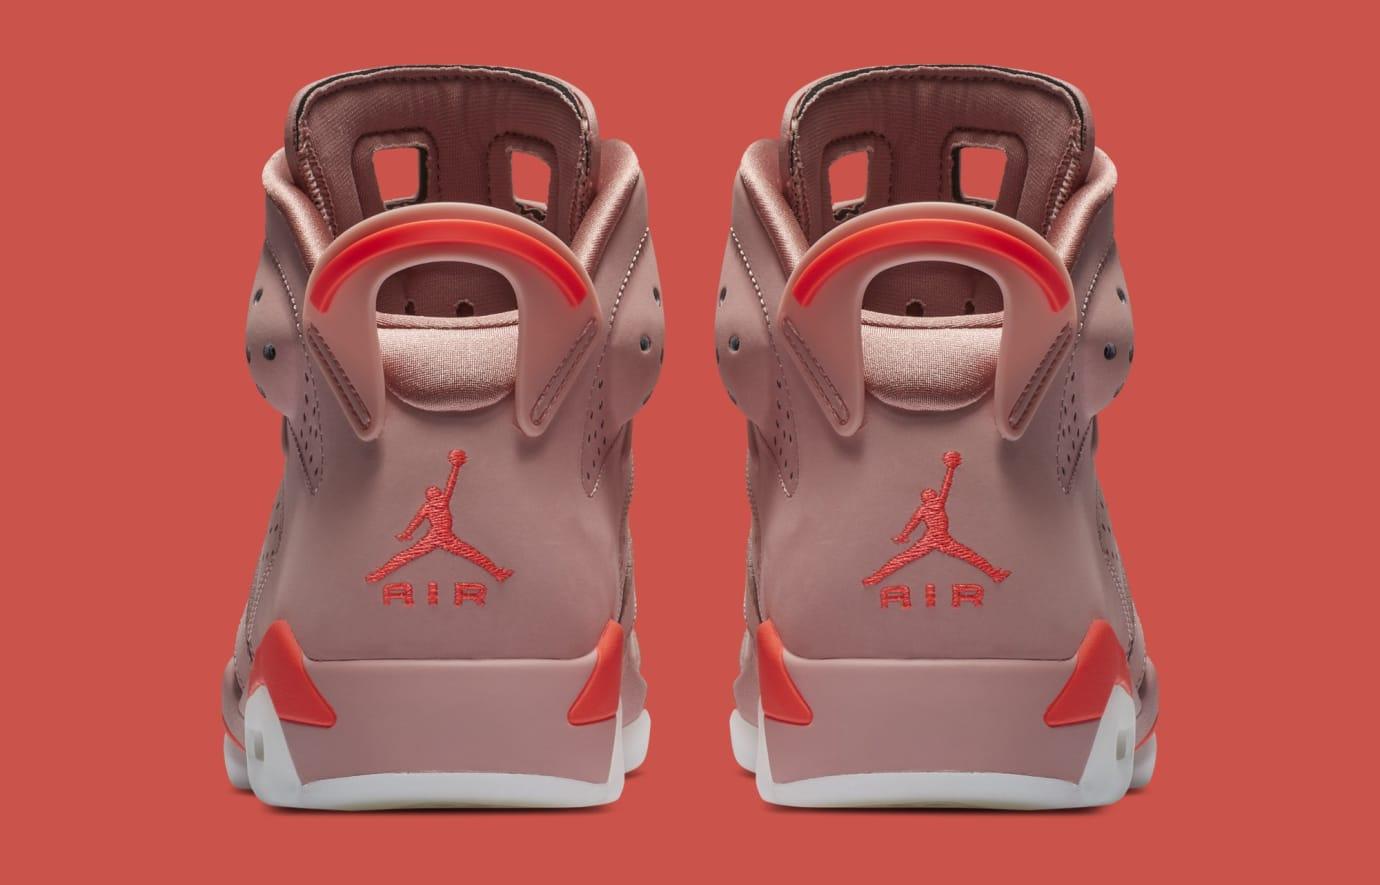 b2c505ee9c4e30 Image via Nike Aleali May x Air Jordan 6  Rust Pink Bright Crimson   CI0550-600